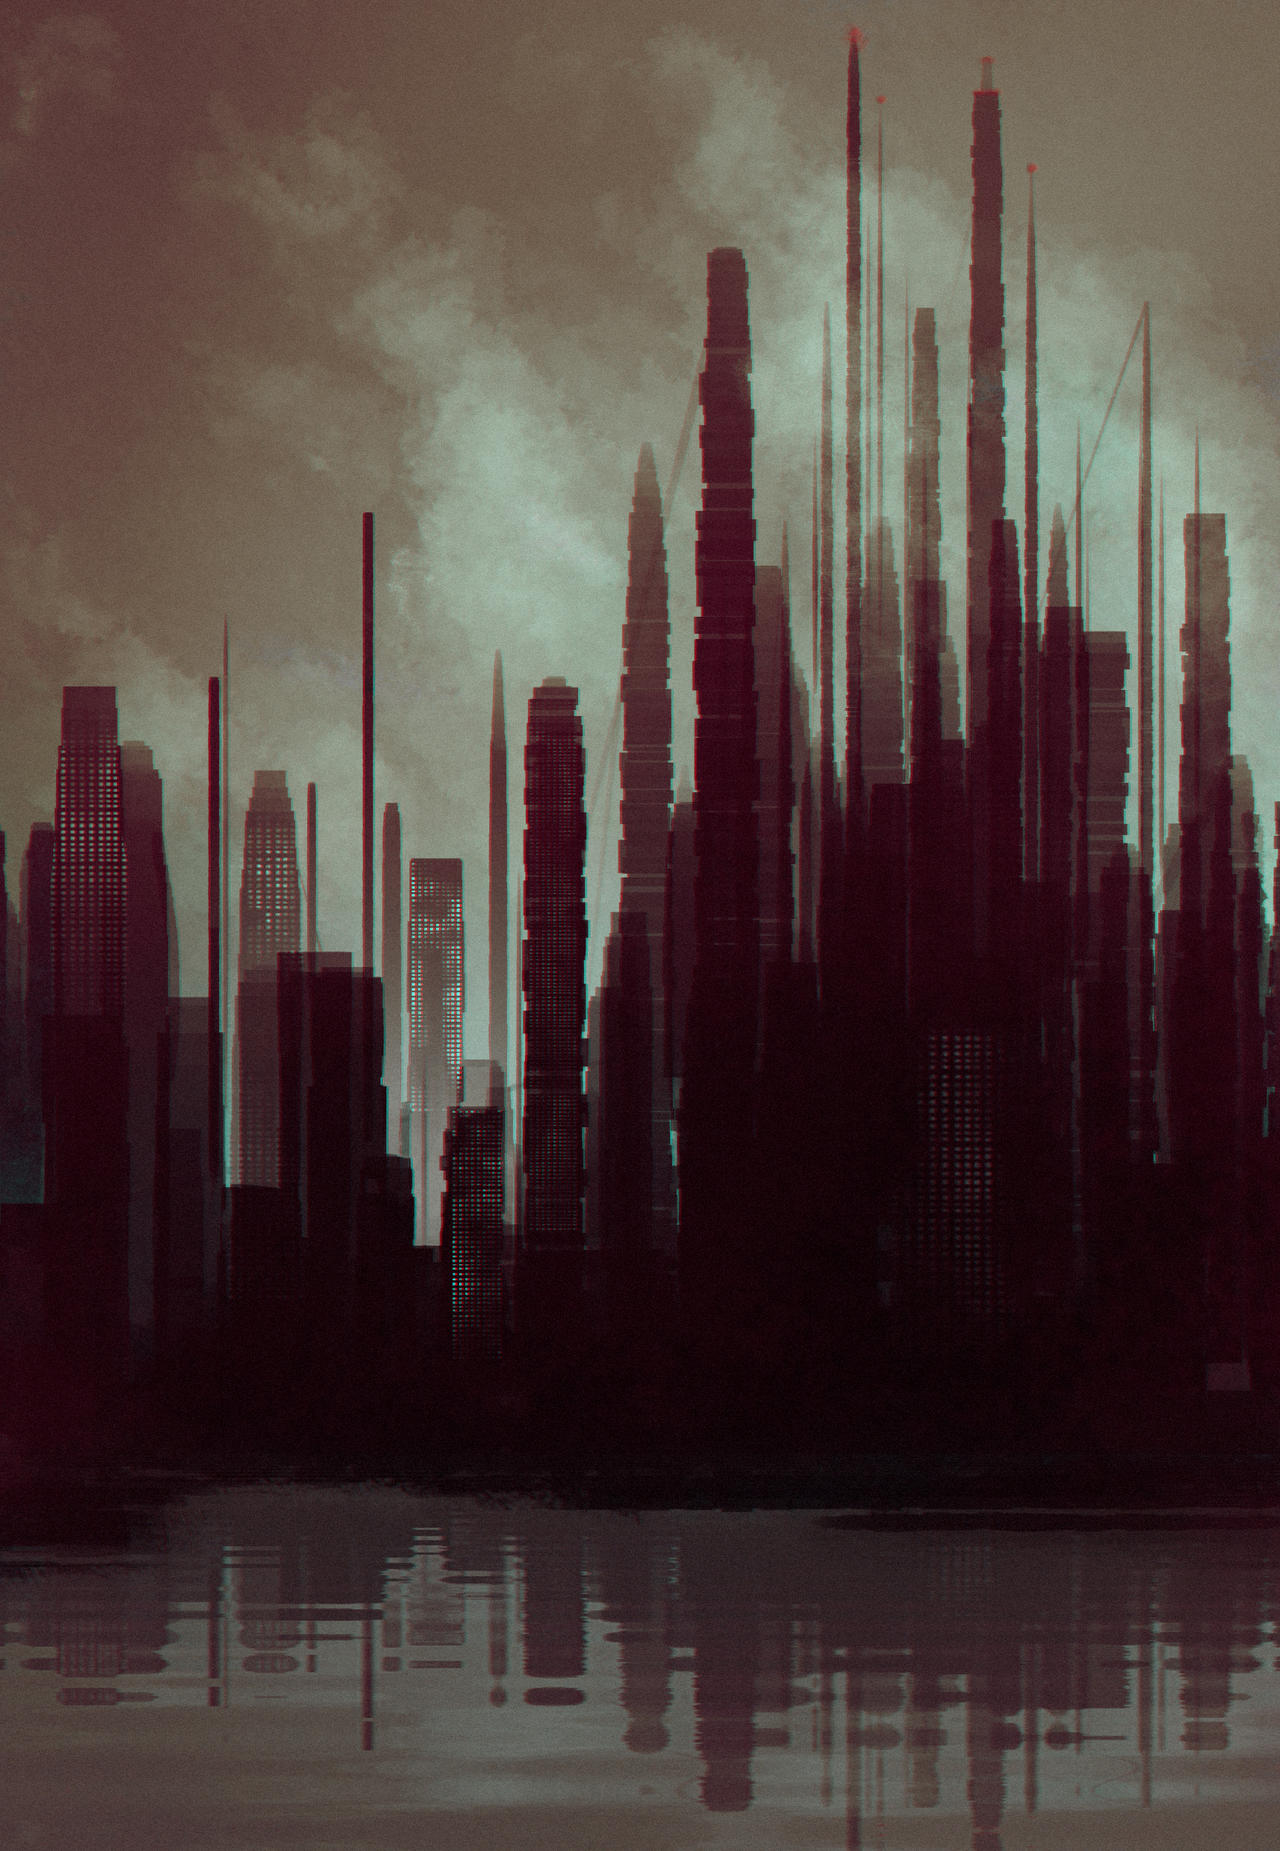 City by 479sam